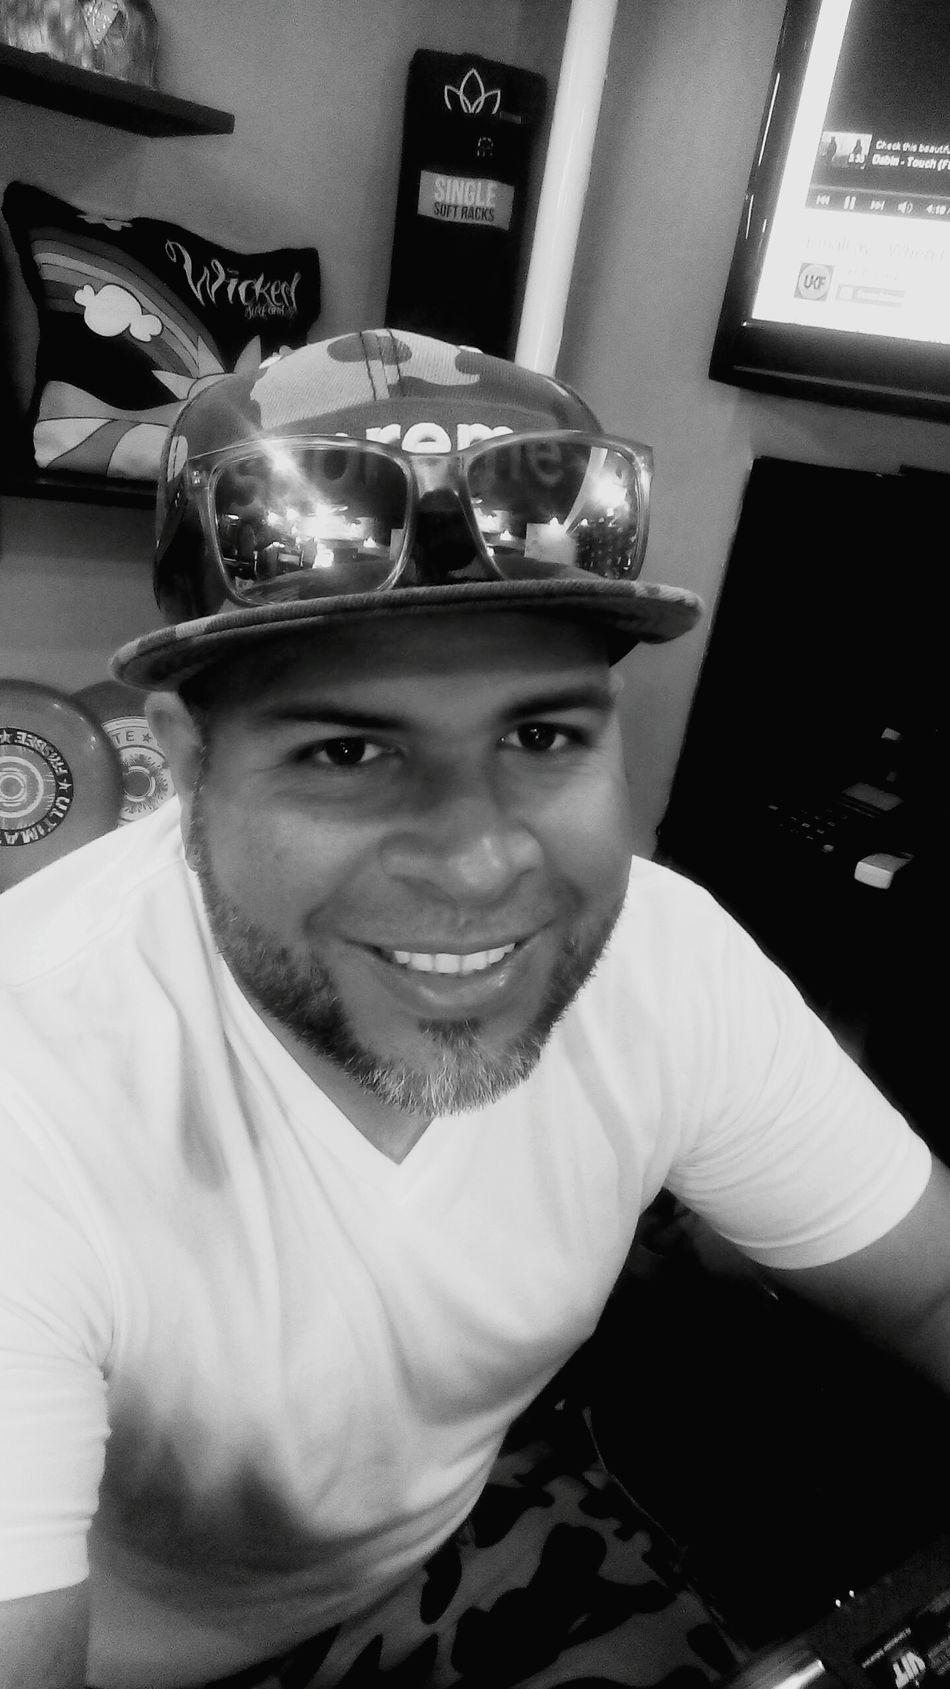 Myself 2015 Selfie Venezuela Morenos Quality Time Pure Perfection Fashion Style Bigboy Smile Supreme